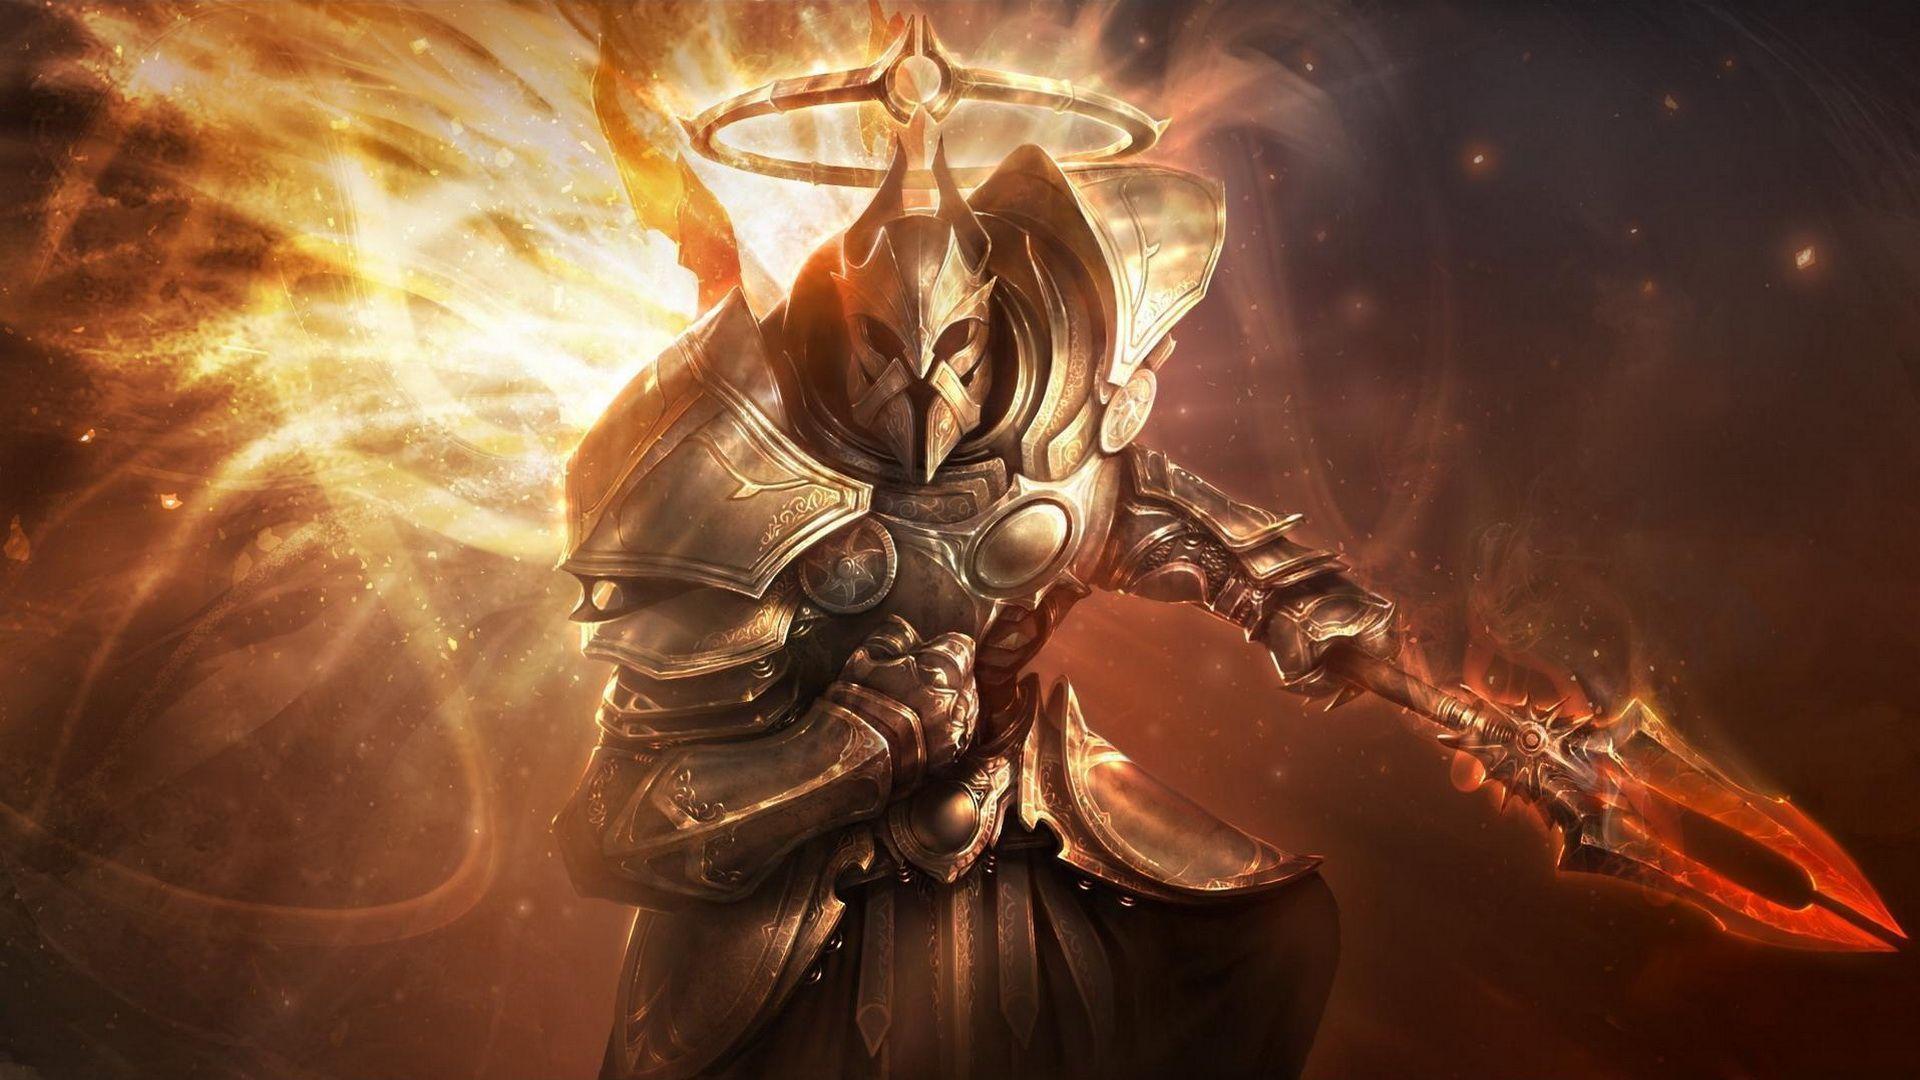 Diablo 3 | Wallpaper Gamer